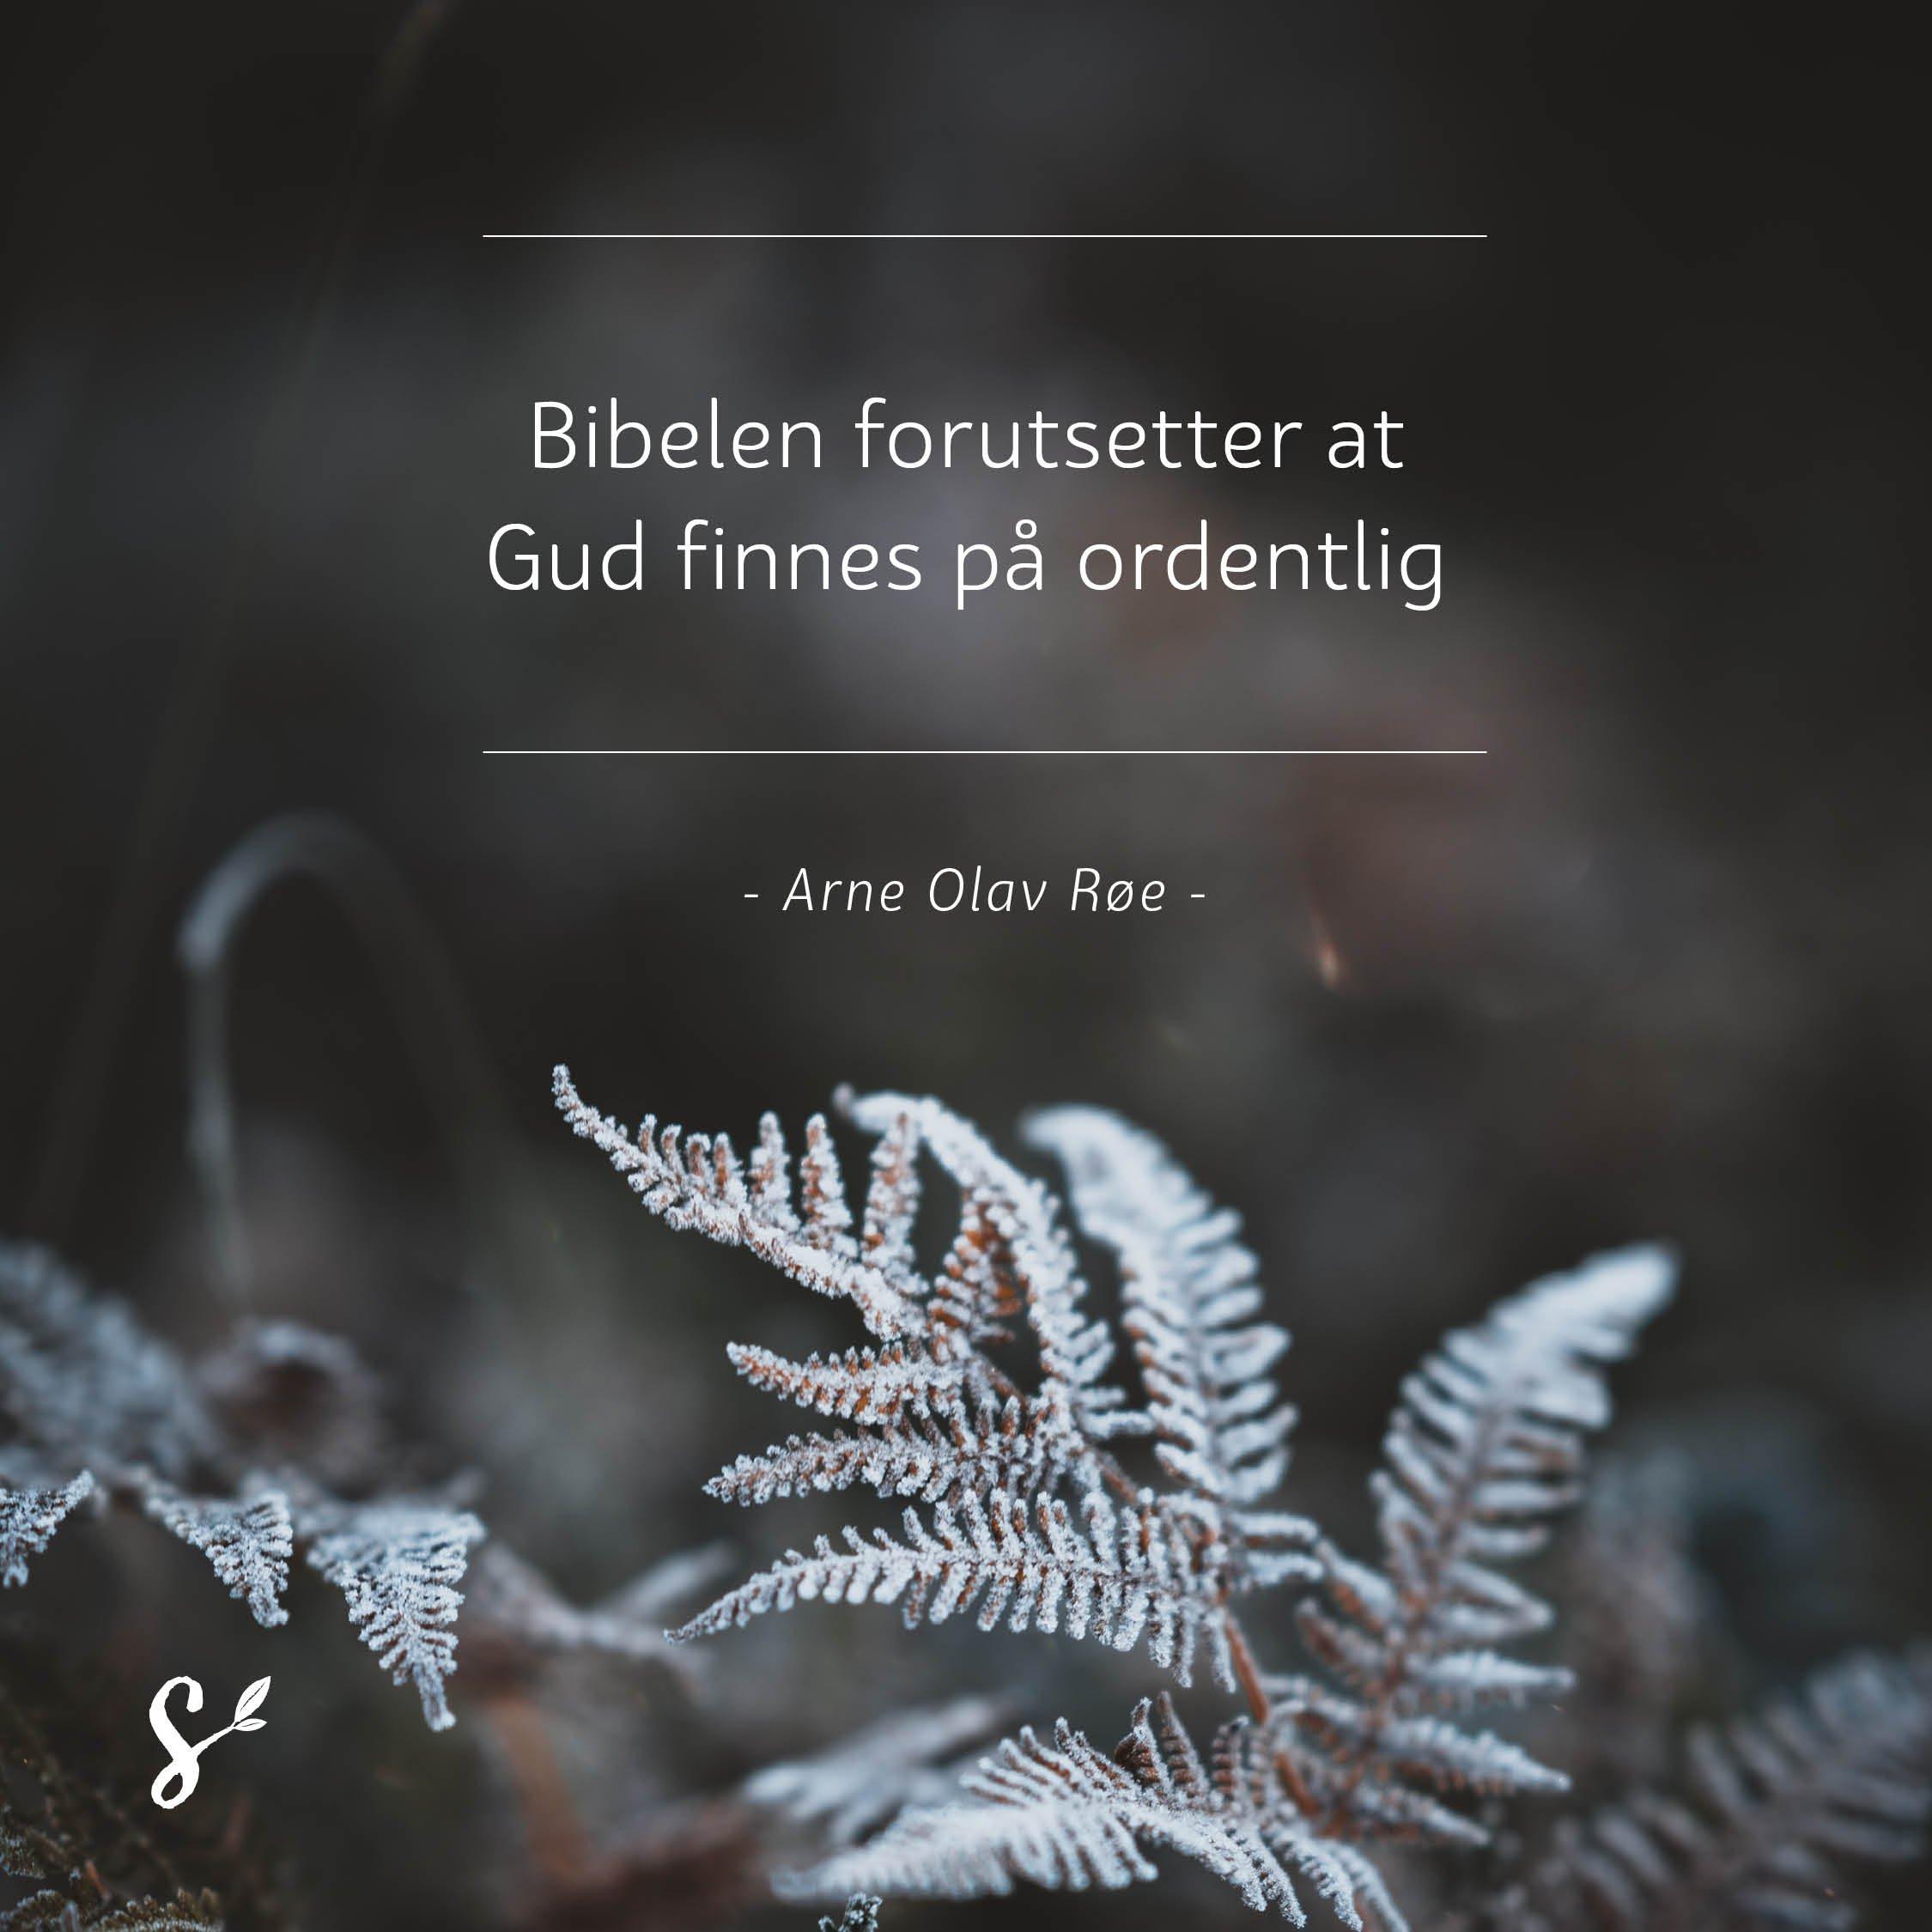 Finnes Jordan Petersons Gud - sitatbilde